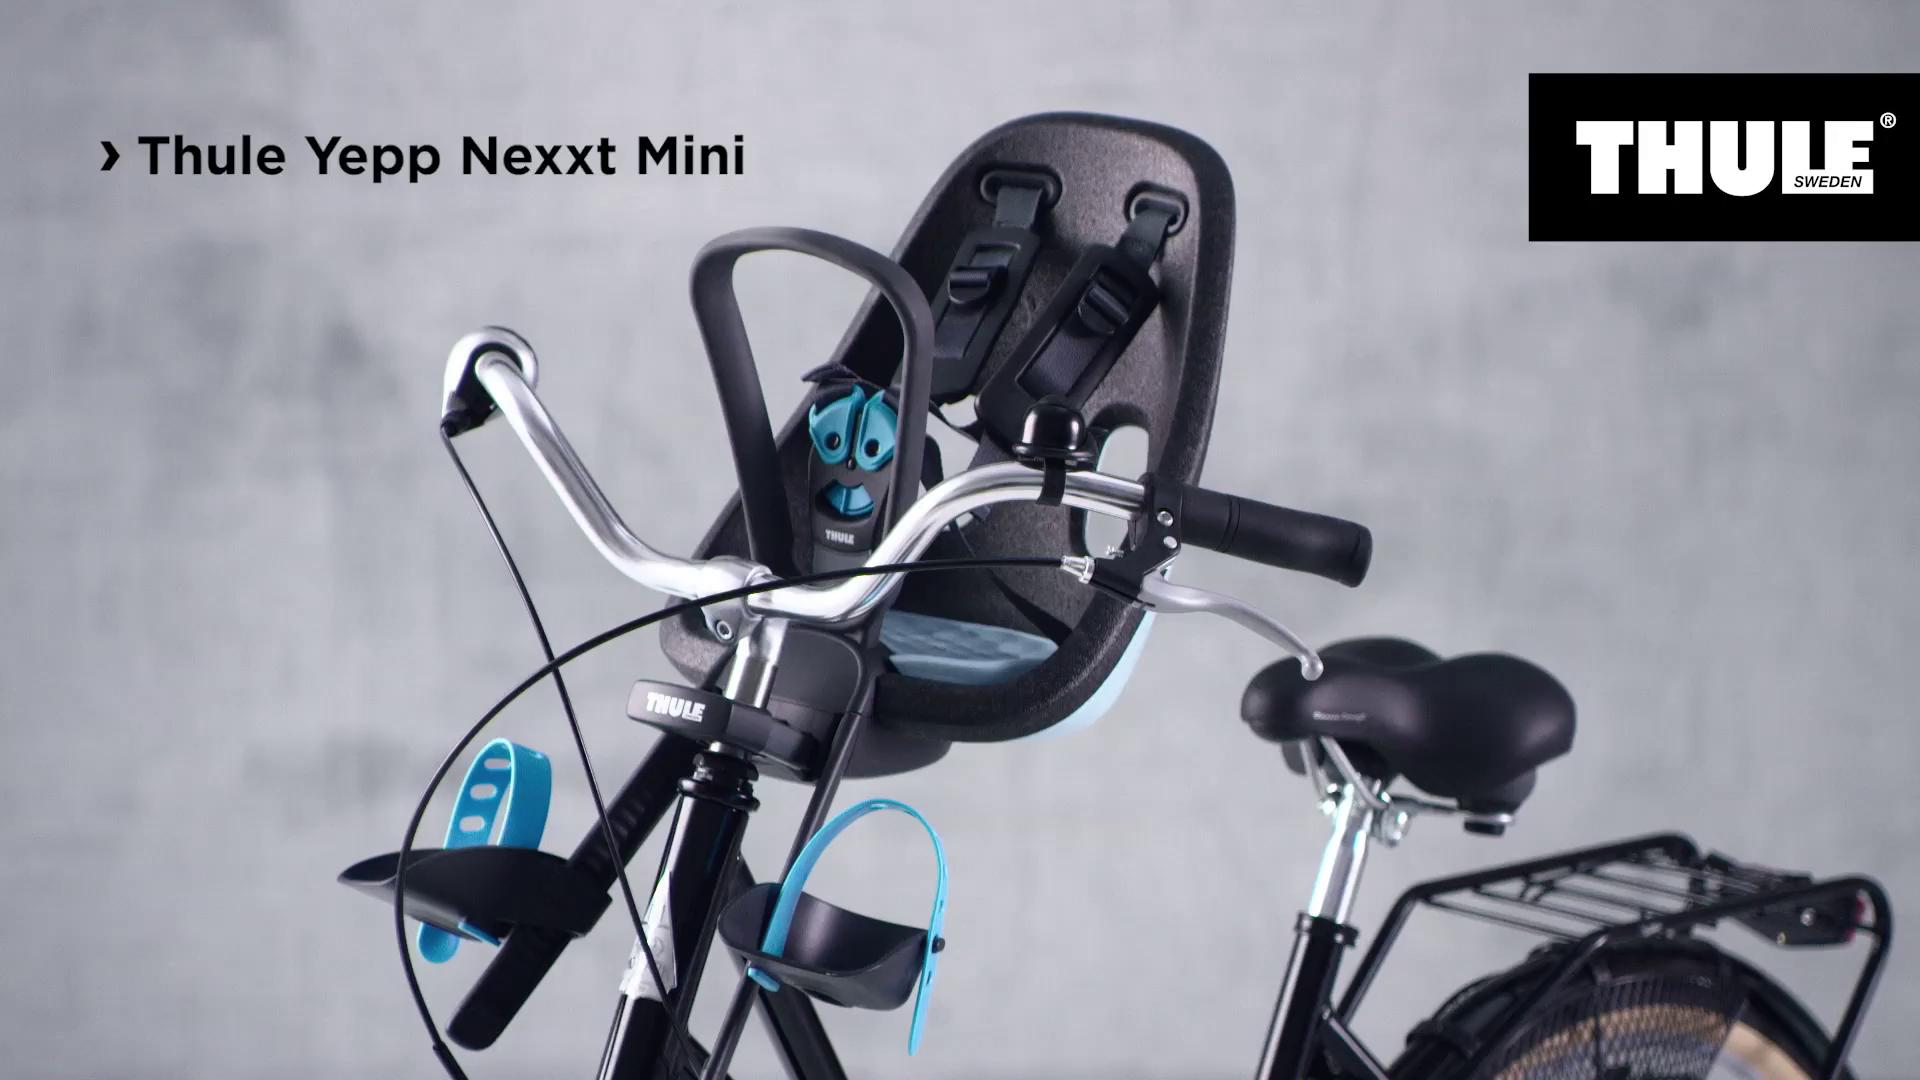 Thule Yepp Nexxt Mini Seat